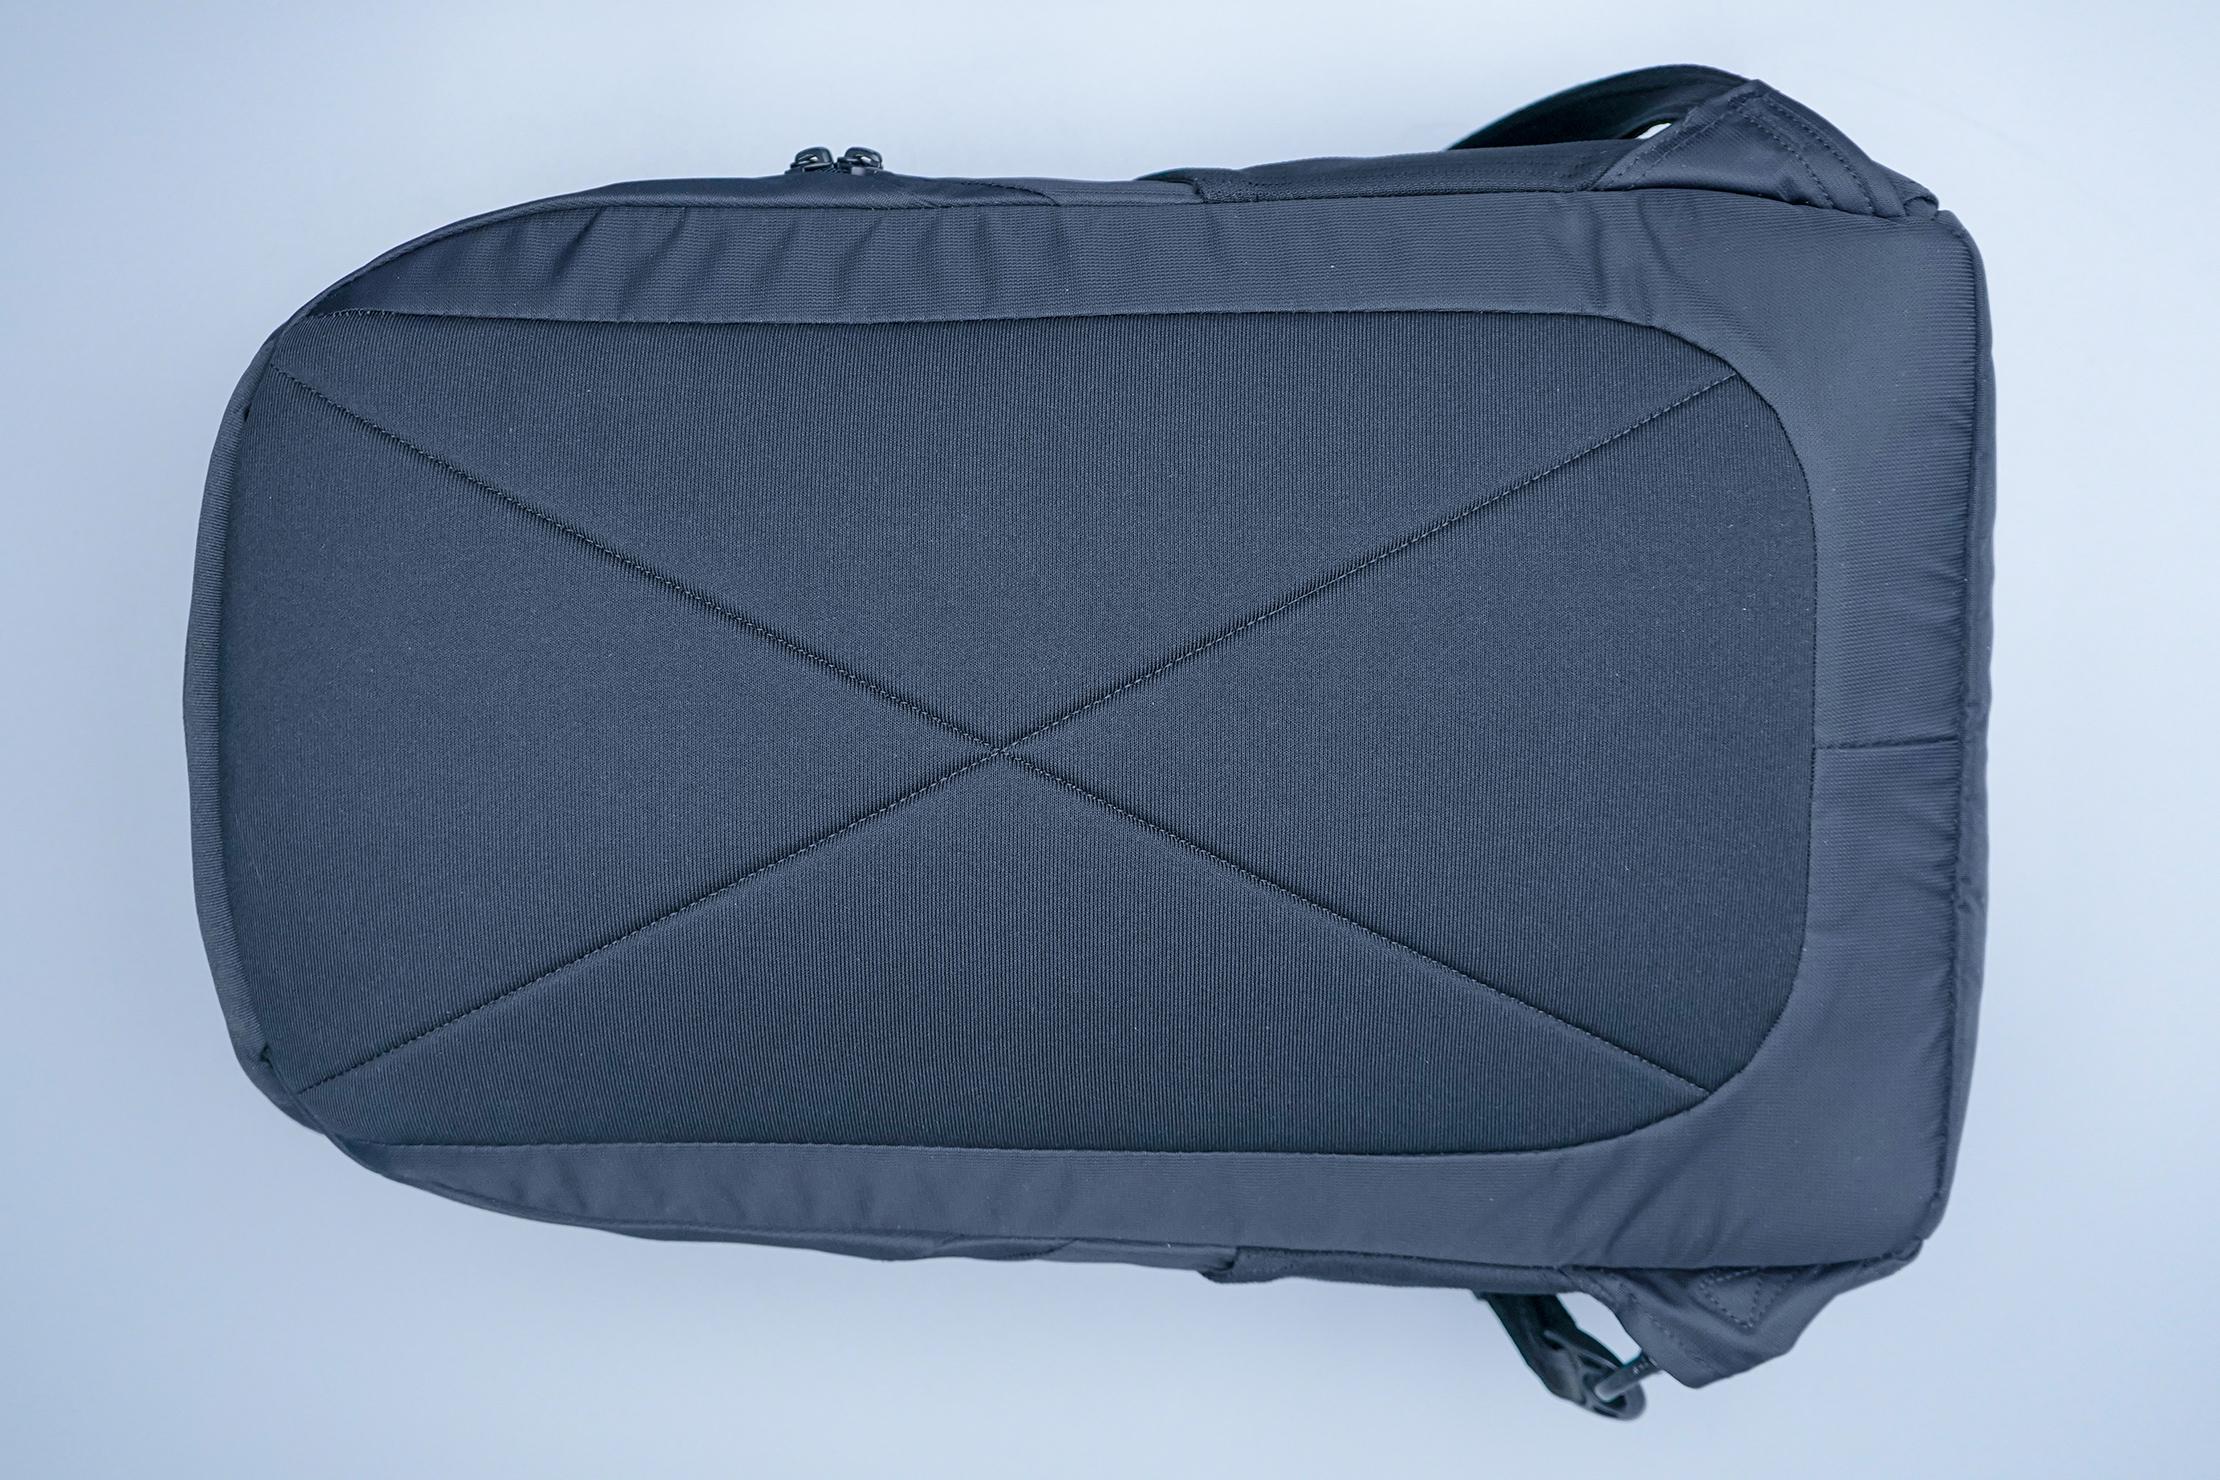 Pacsafe Metrosafe LS450 Anti-Theft Backpack Back Panel